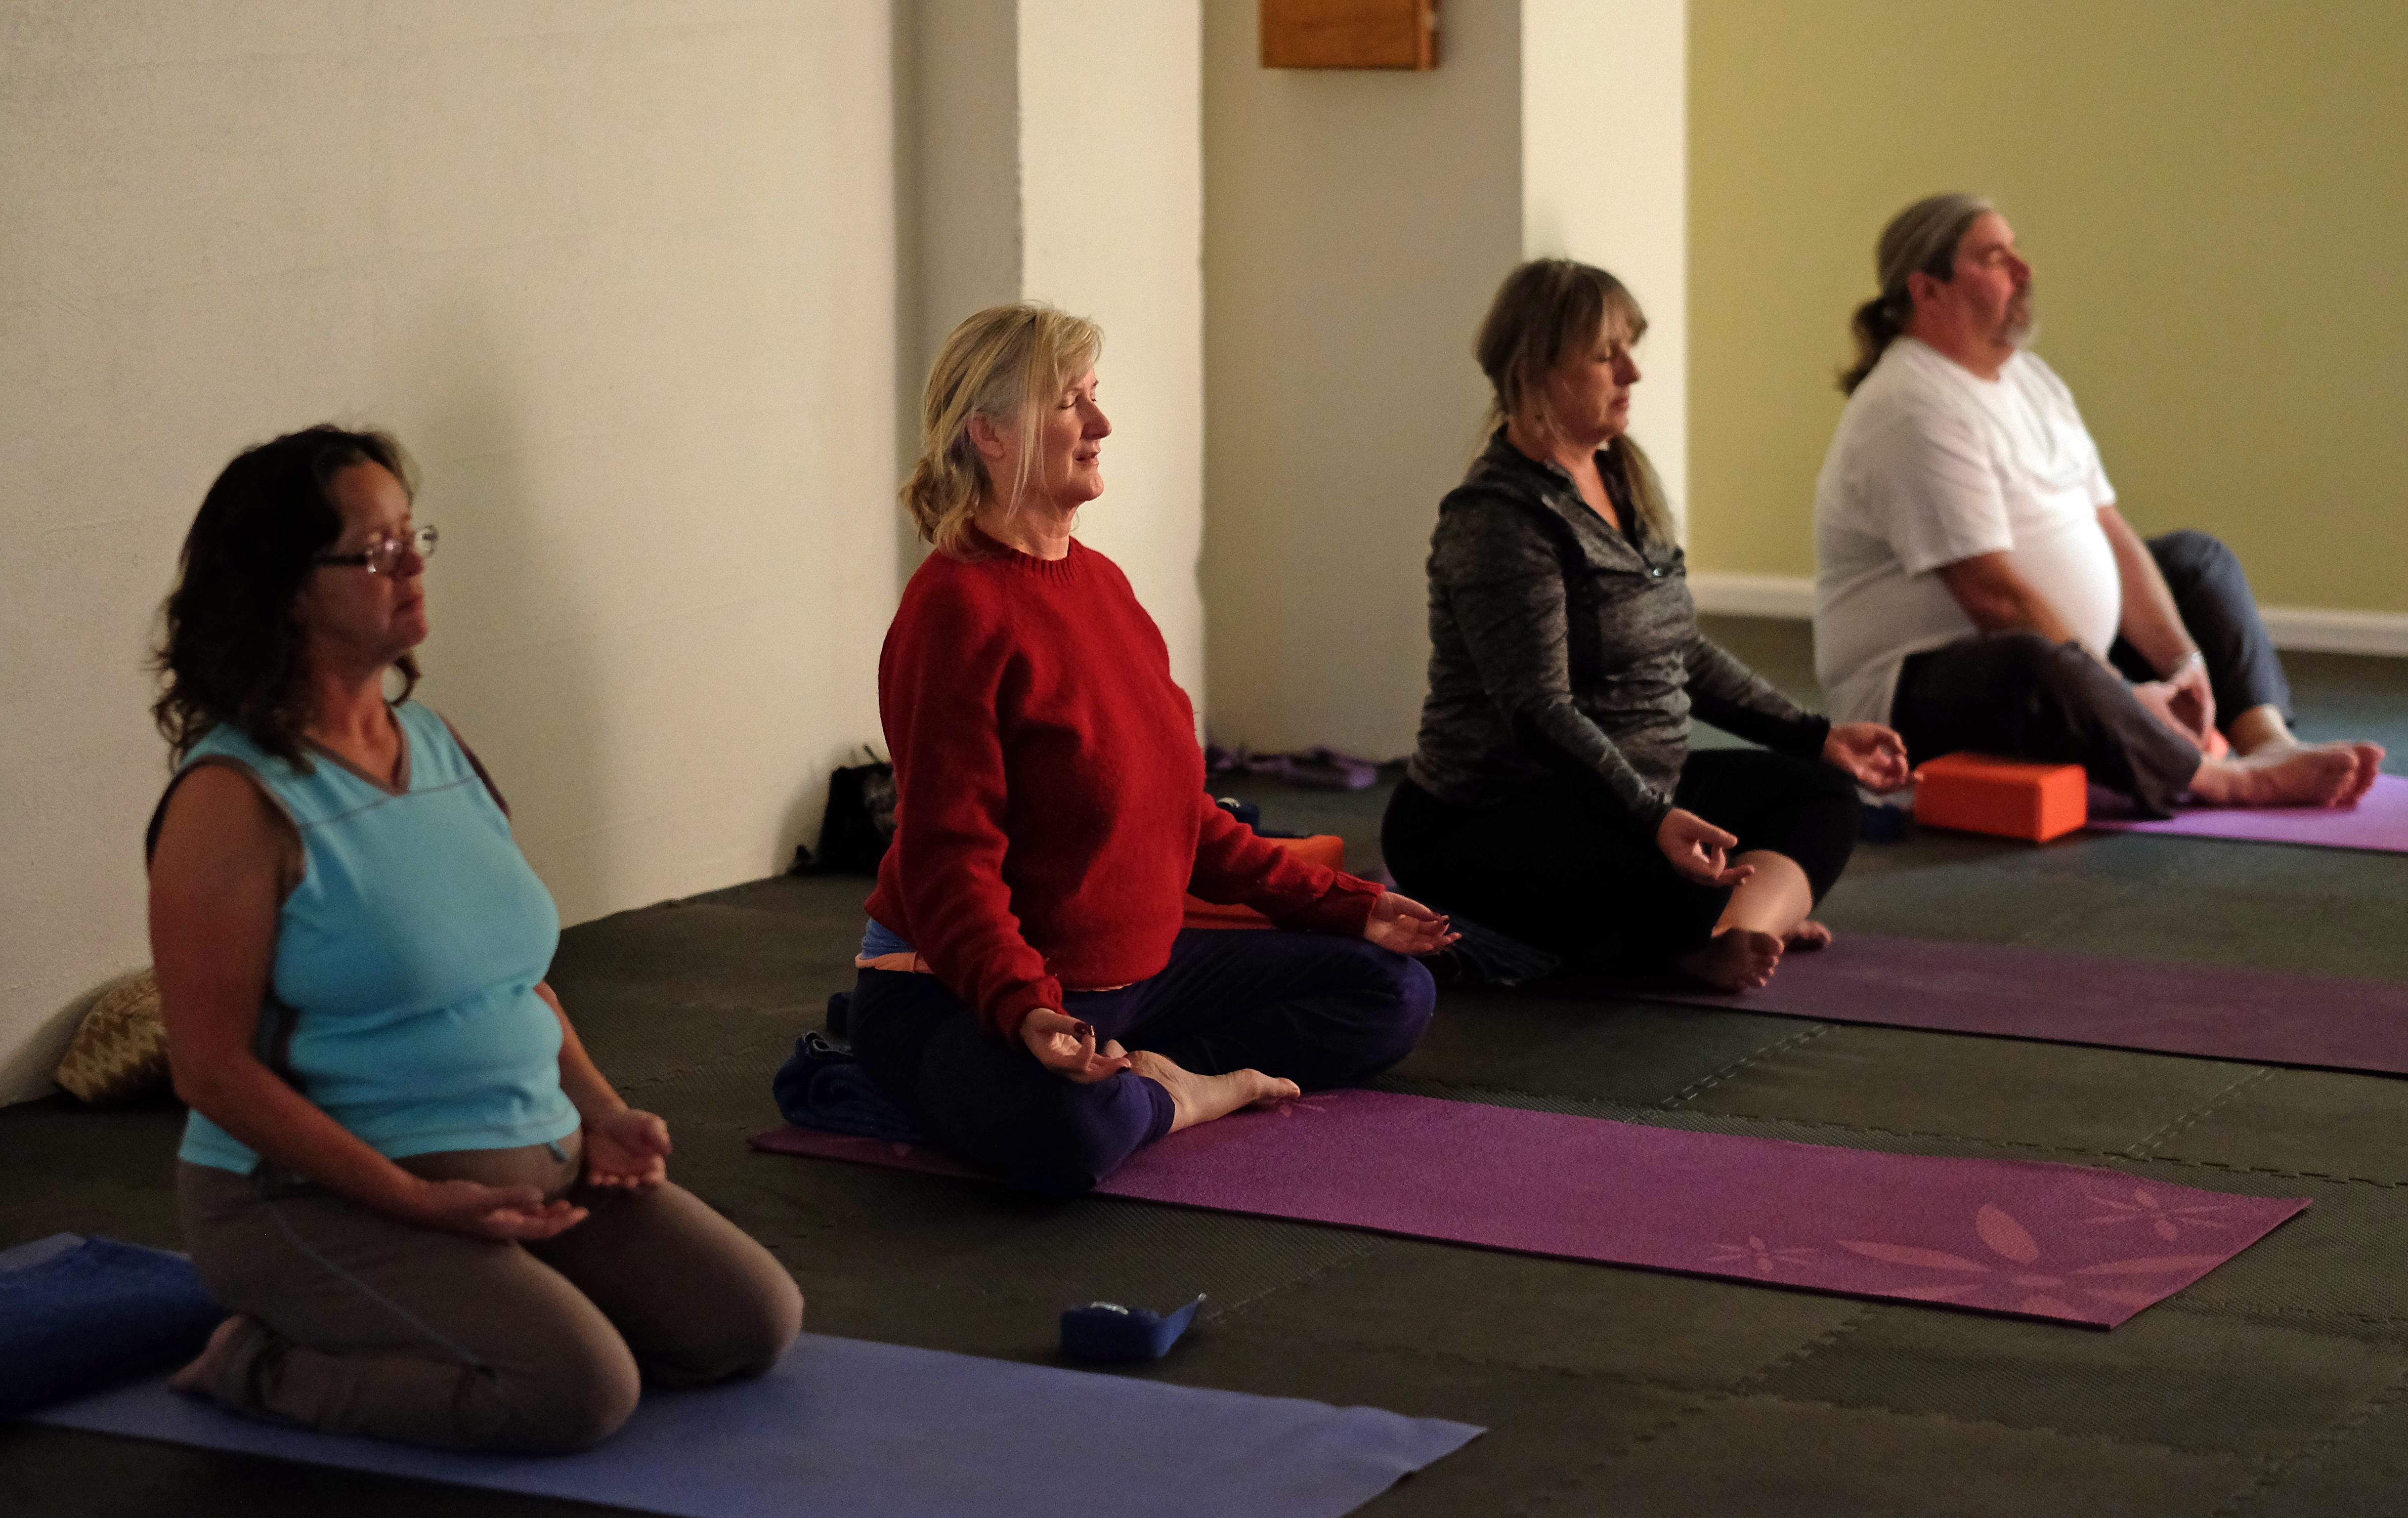 A community yoga class at Birdseed Yoga, Waynesboro, Va. Wednesday Nov. 23, 2016. (Photo by Norm Shafer).